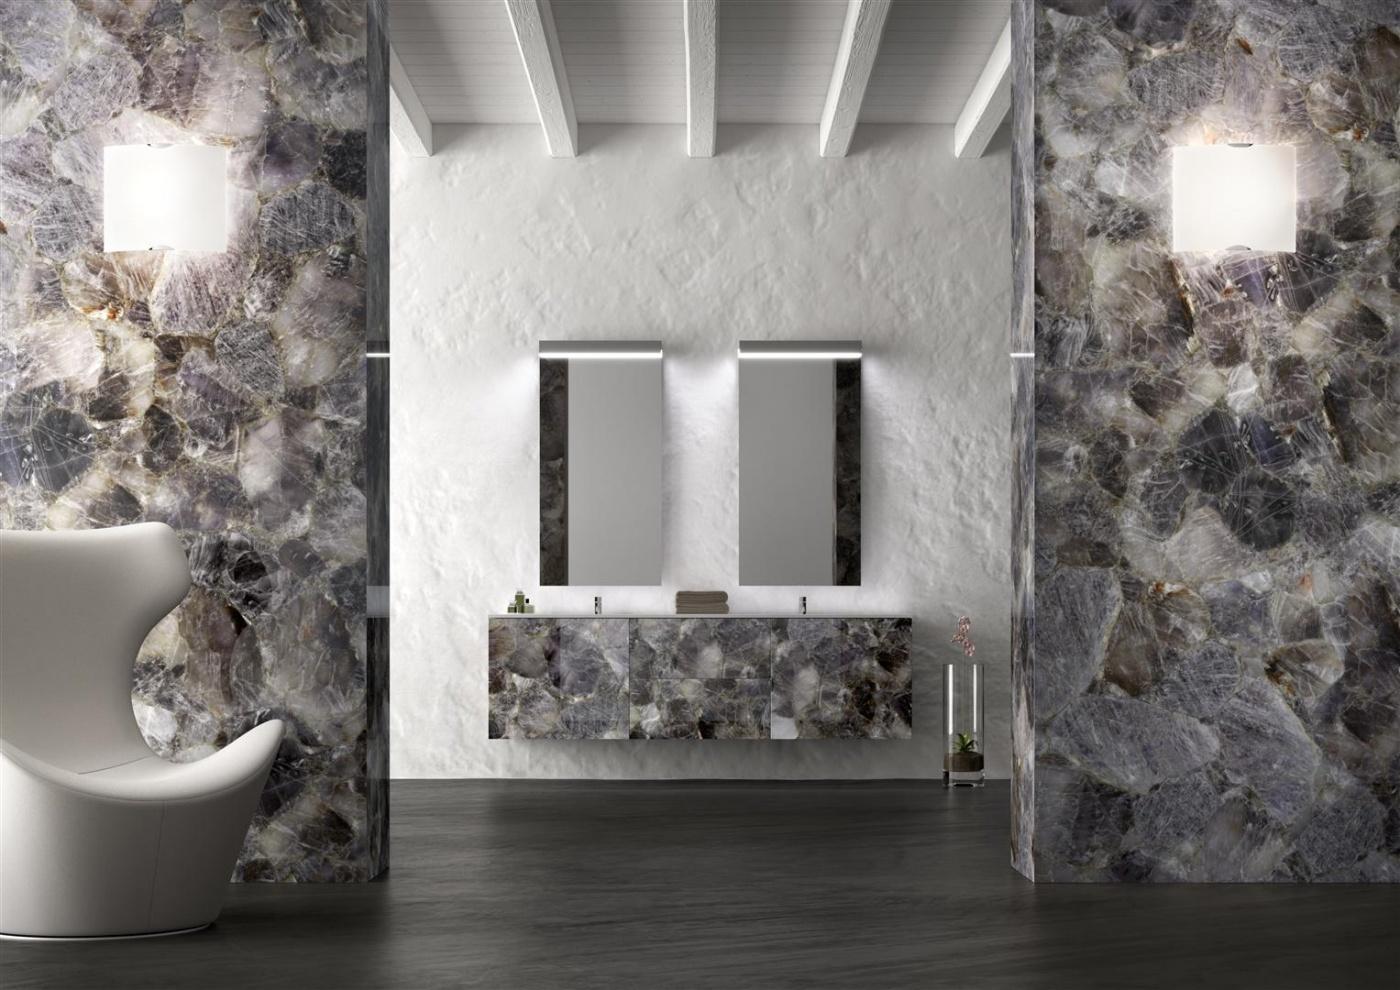 Pierre calcaire Blue Quartz Bathroom